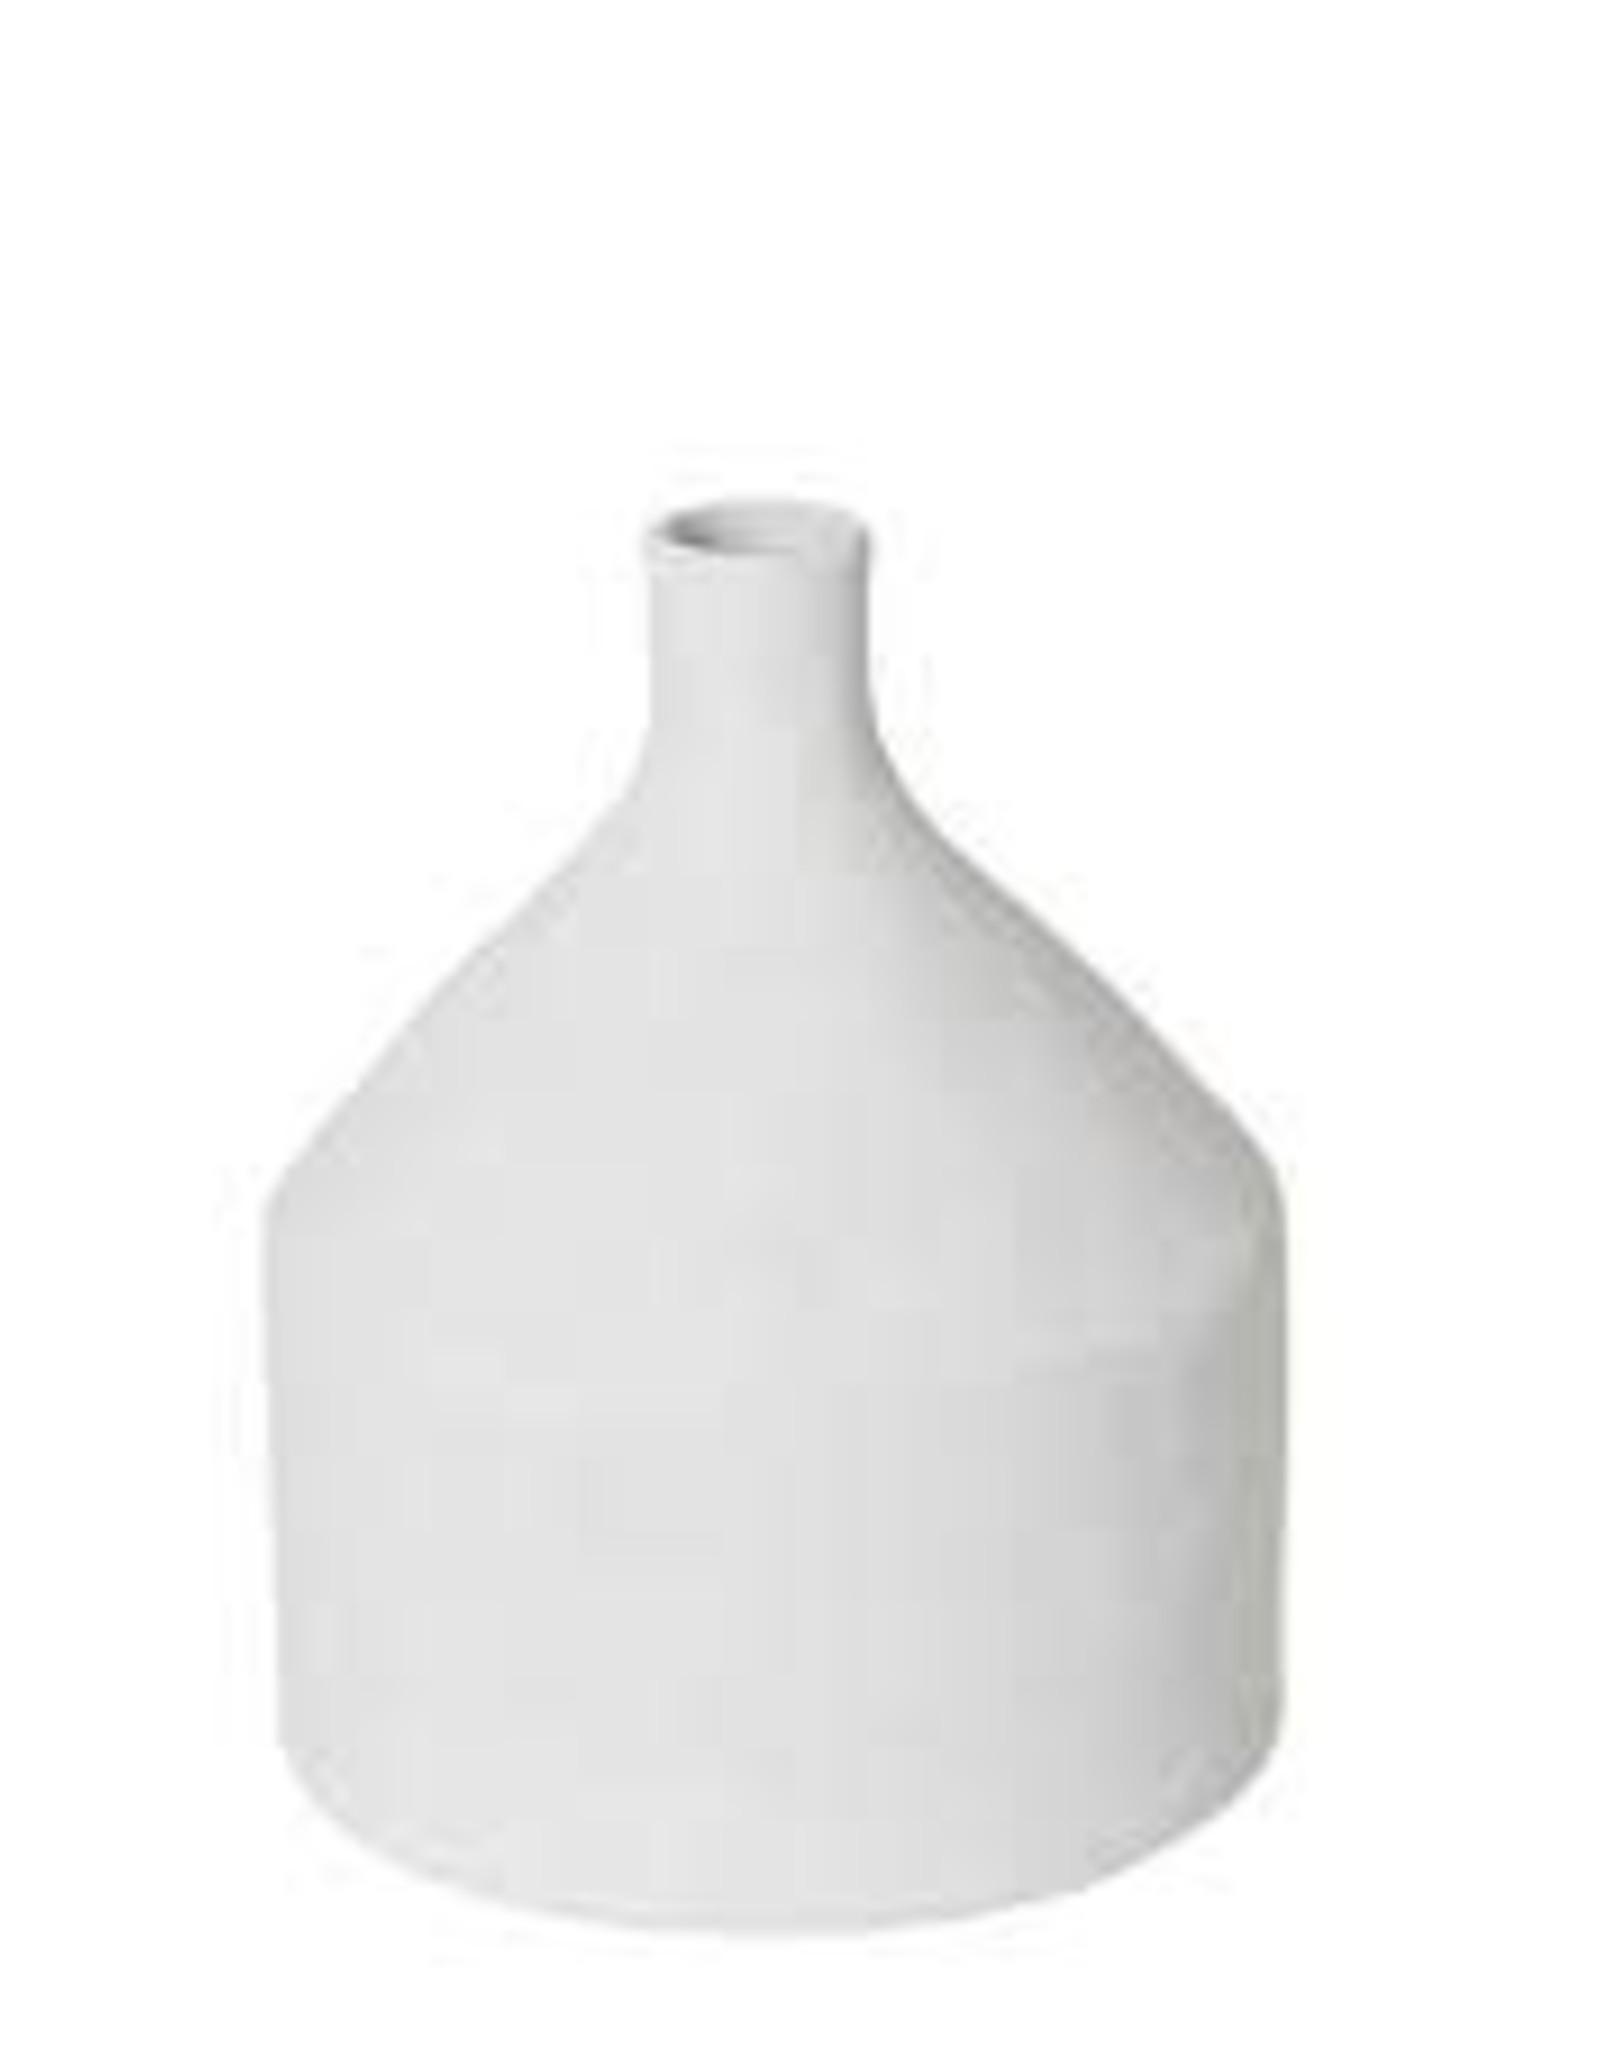 Imani white textured bottle vase